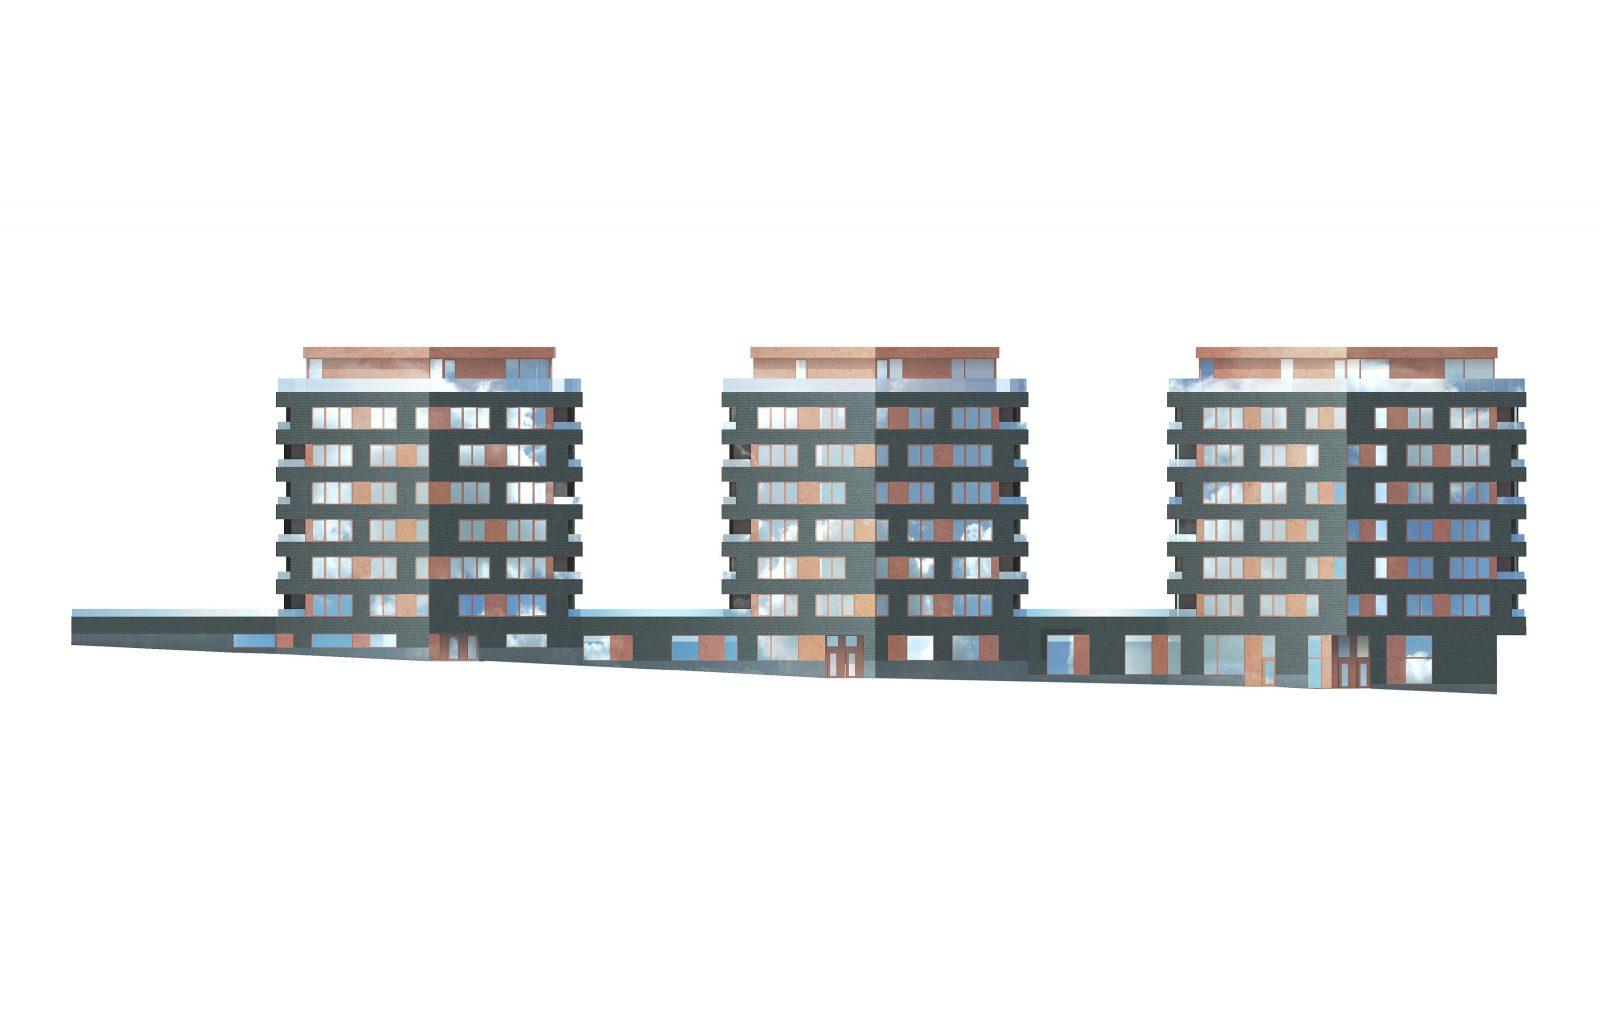 KjellanderSjoberg Fredriksdal facade longitude